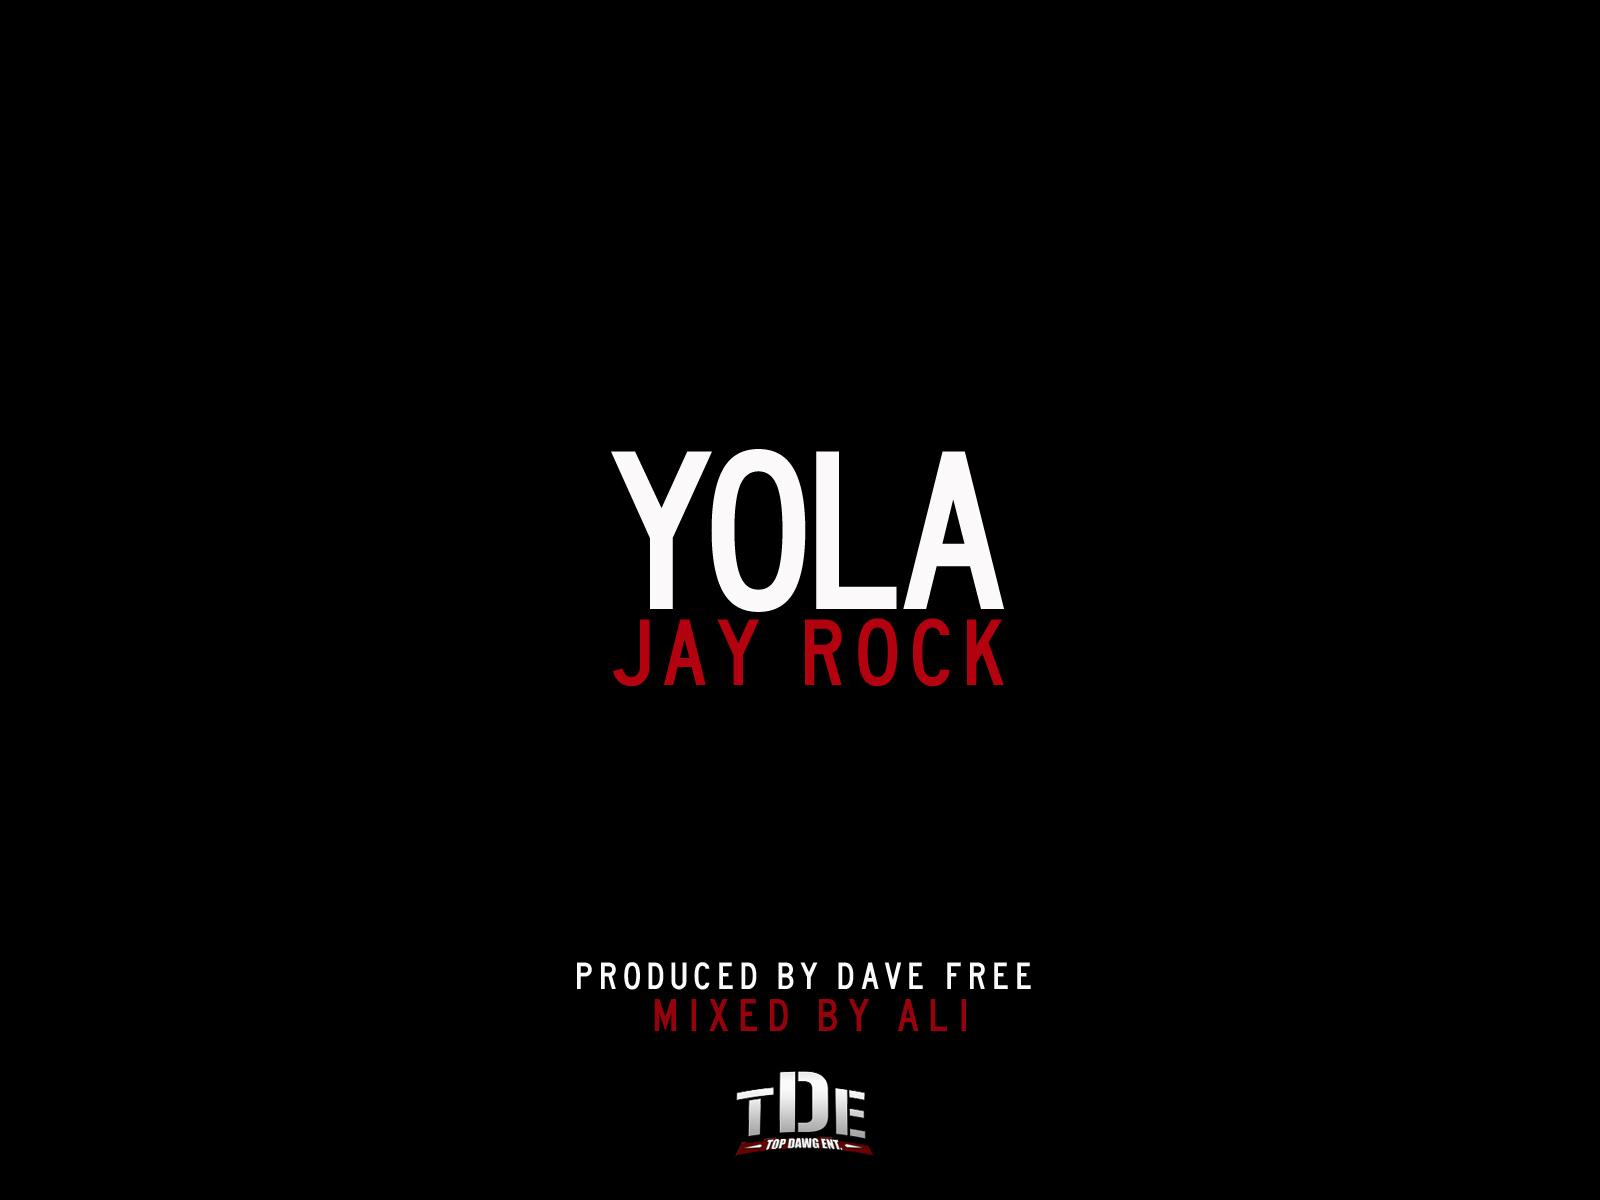 Jay Rock - YOLA [mp3]